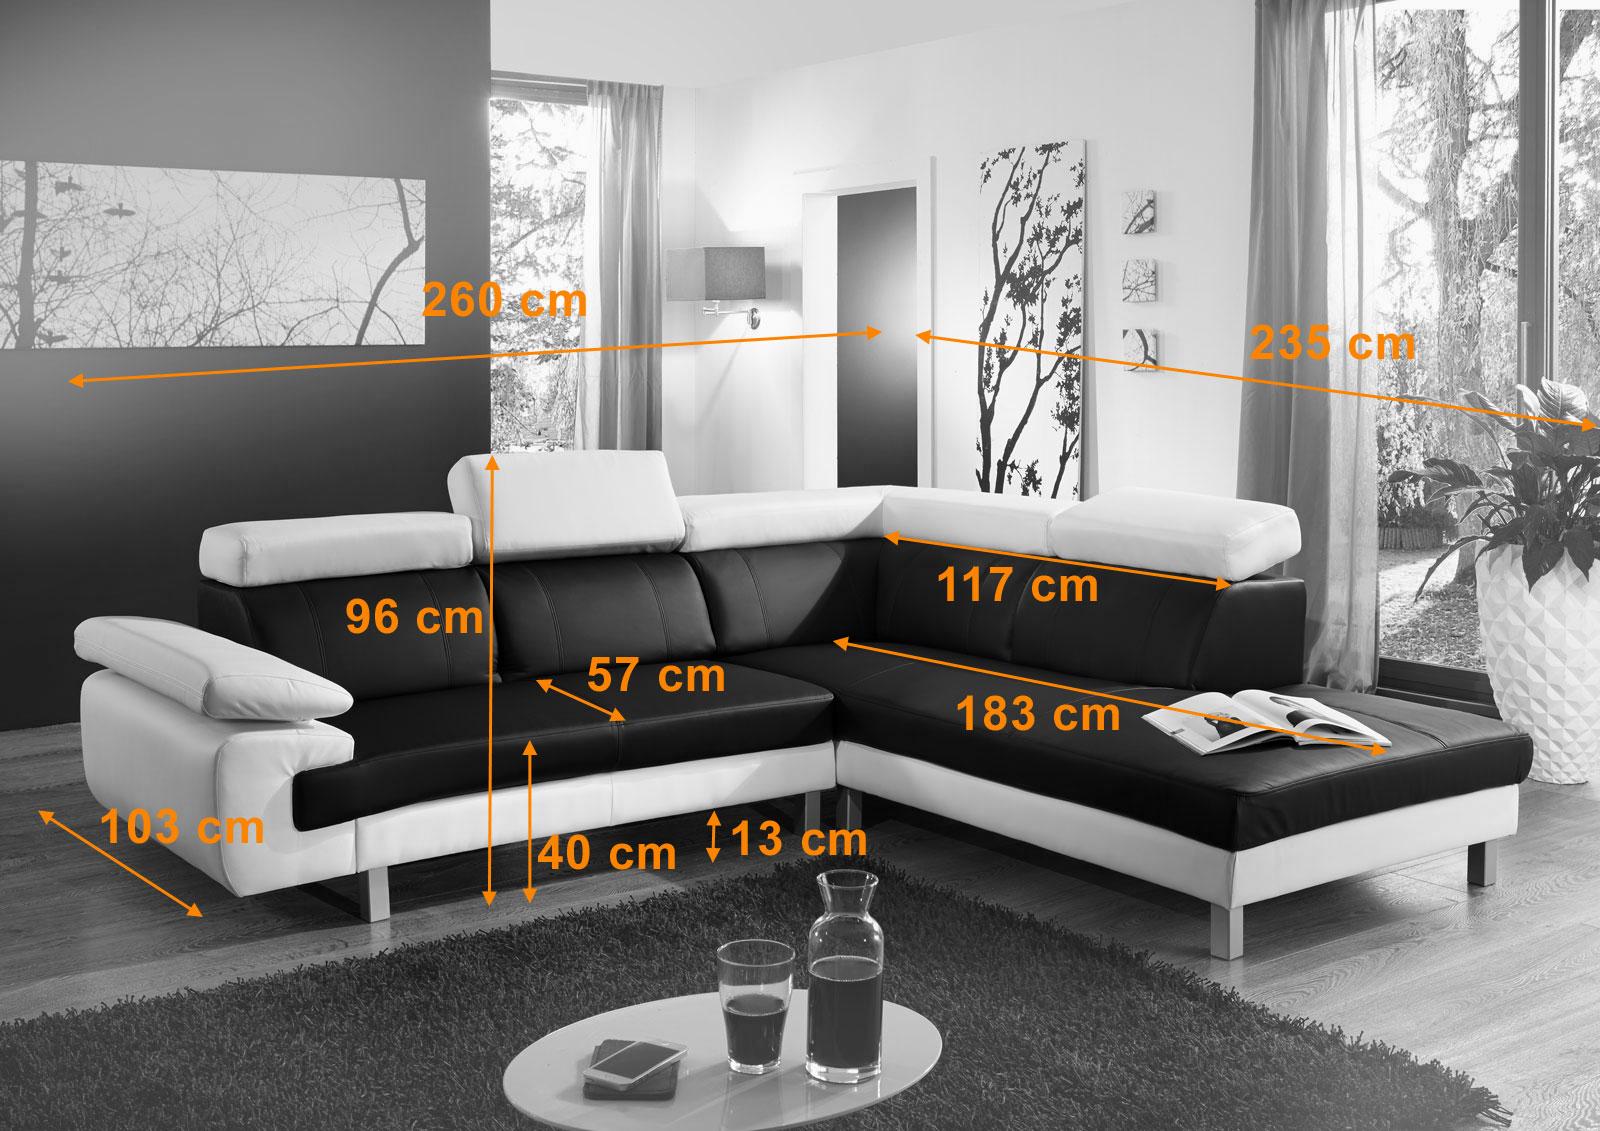 SAM® Ecksofa schwarz weiß Polsterecke Merida 260 x 235 cm -> Ecksofa Trends